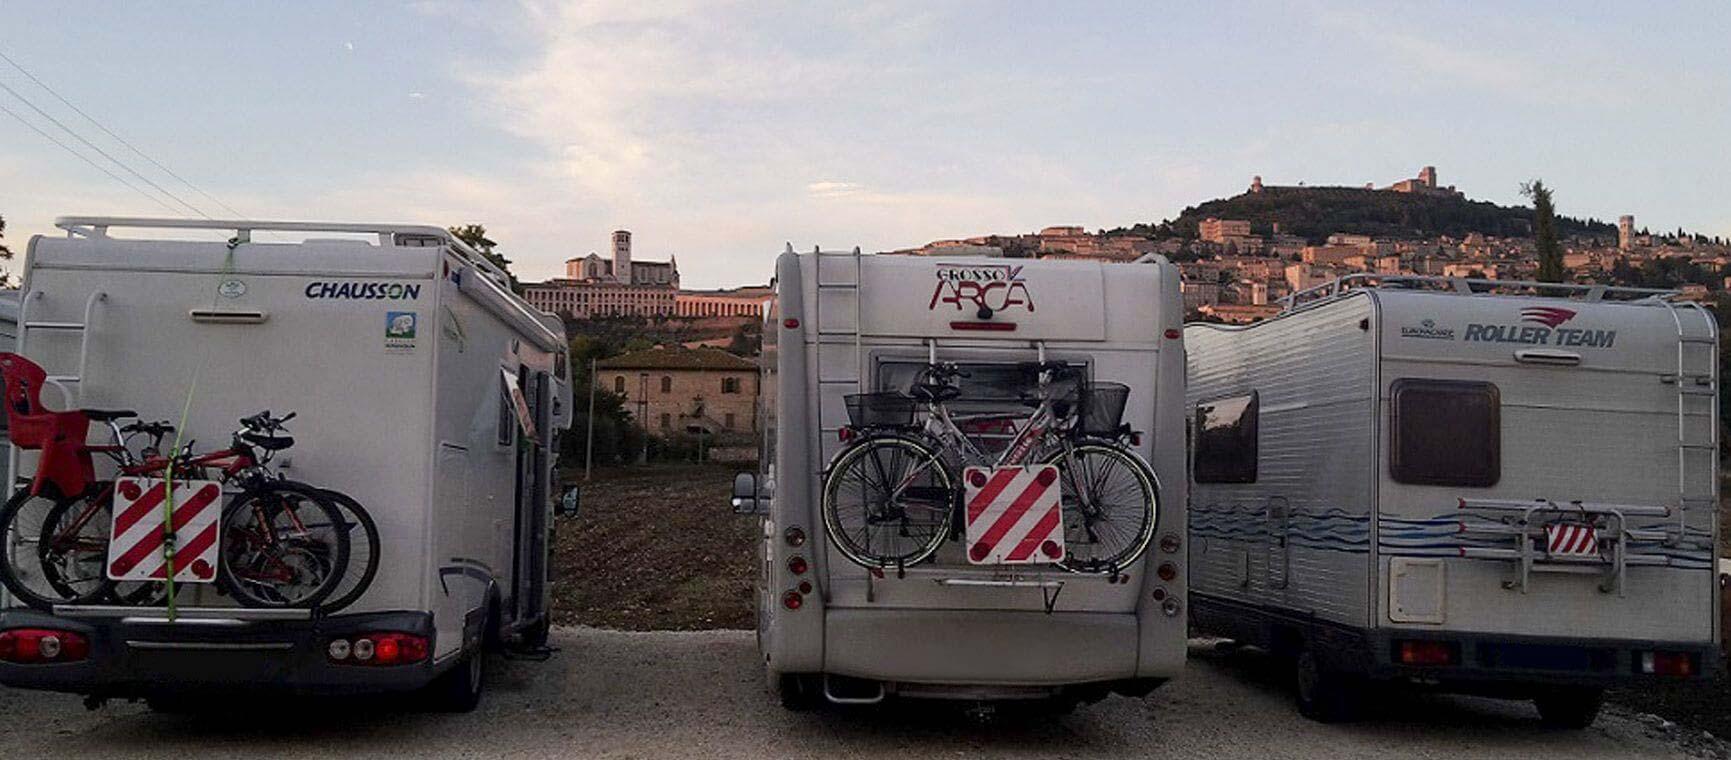 Vacanze in camper ad Assisi. Agrisosta All'Antica Mattonata